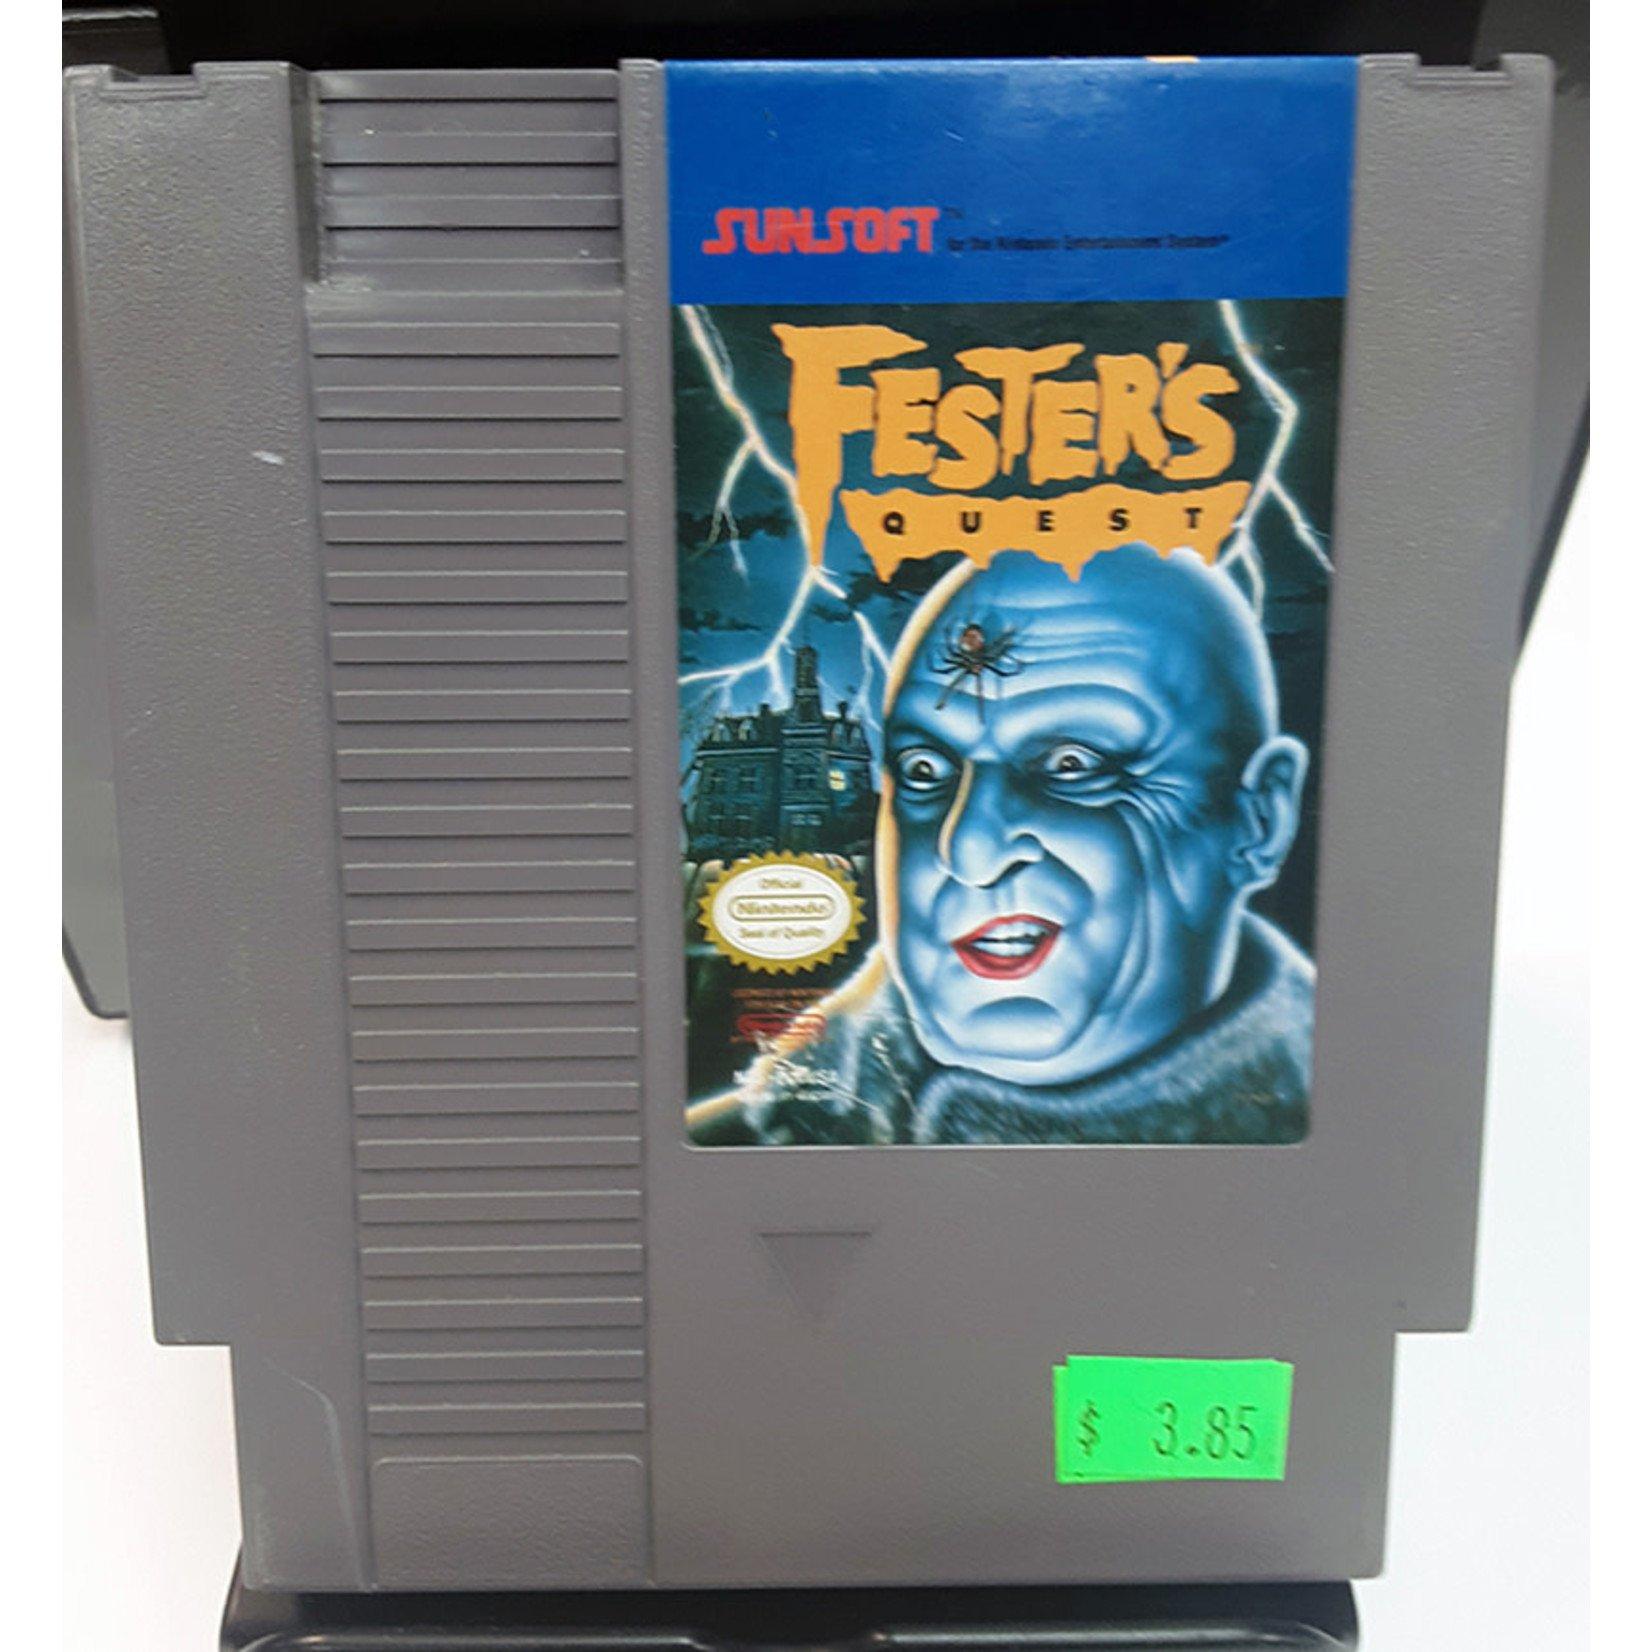 nesu-Fester's Quest (cartridge)